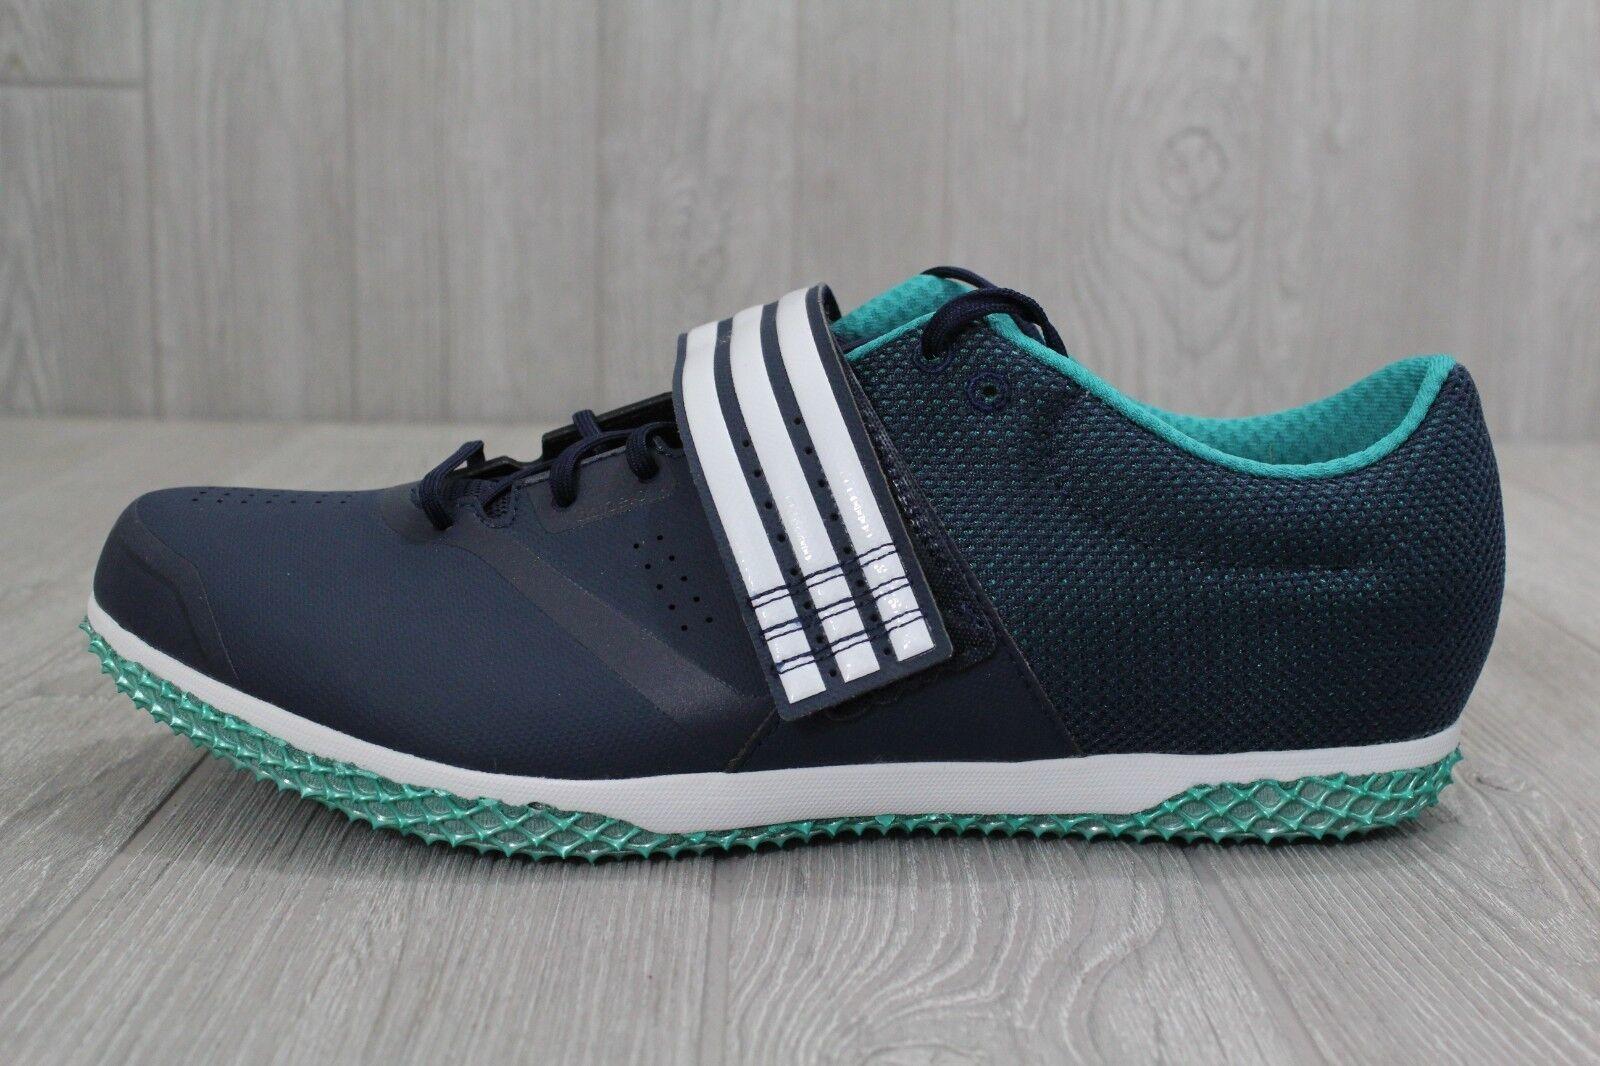 26 nuovi Uomo uomini adidas adizero hj Uomo nuovi 5,5 - 14 campo di atletica scarpe blu af5645 8656c8